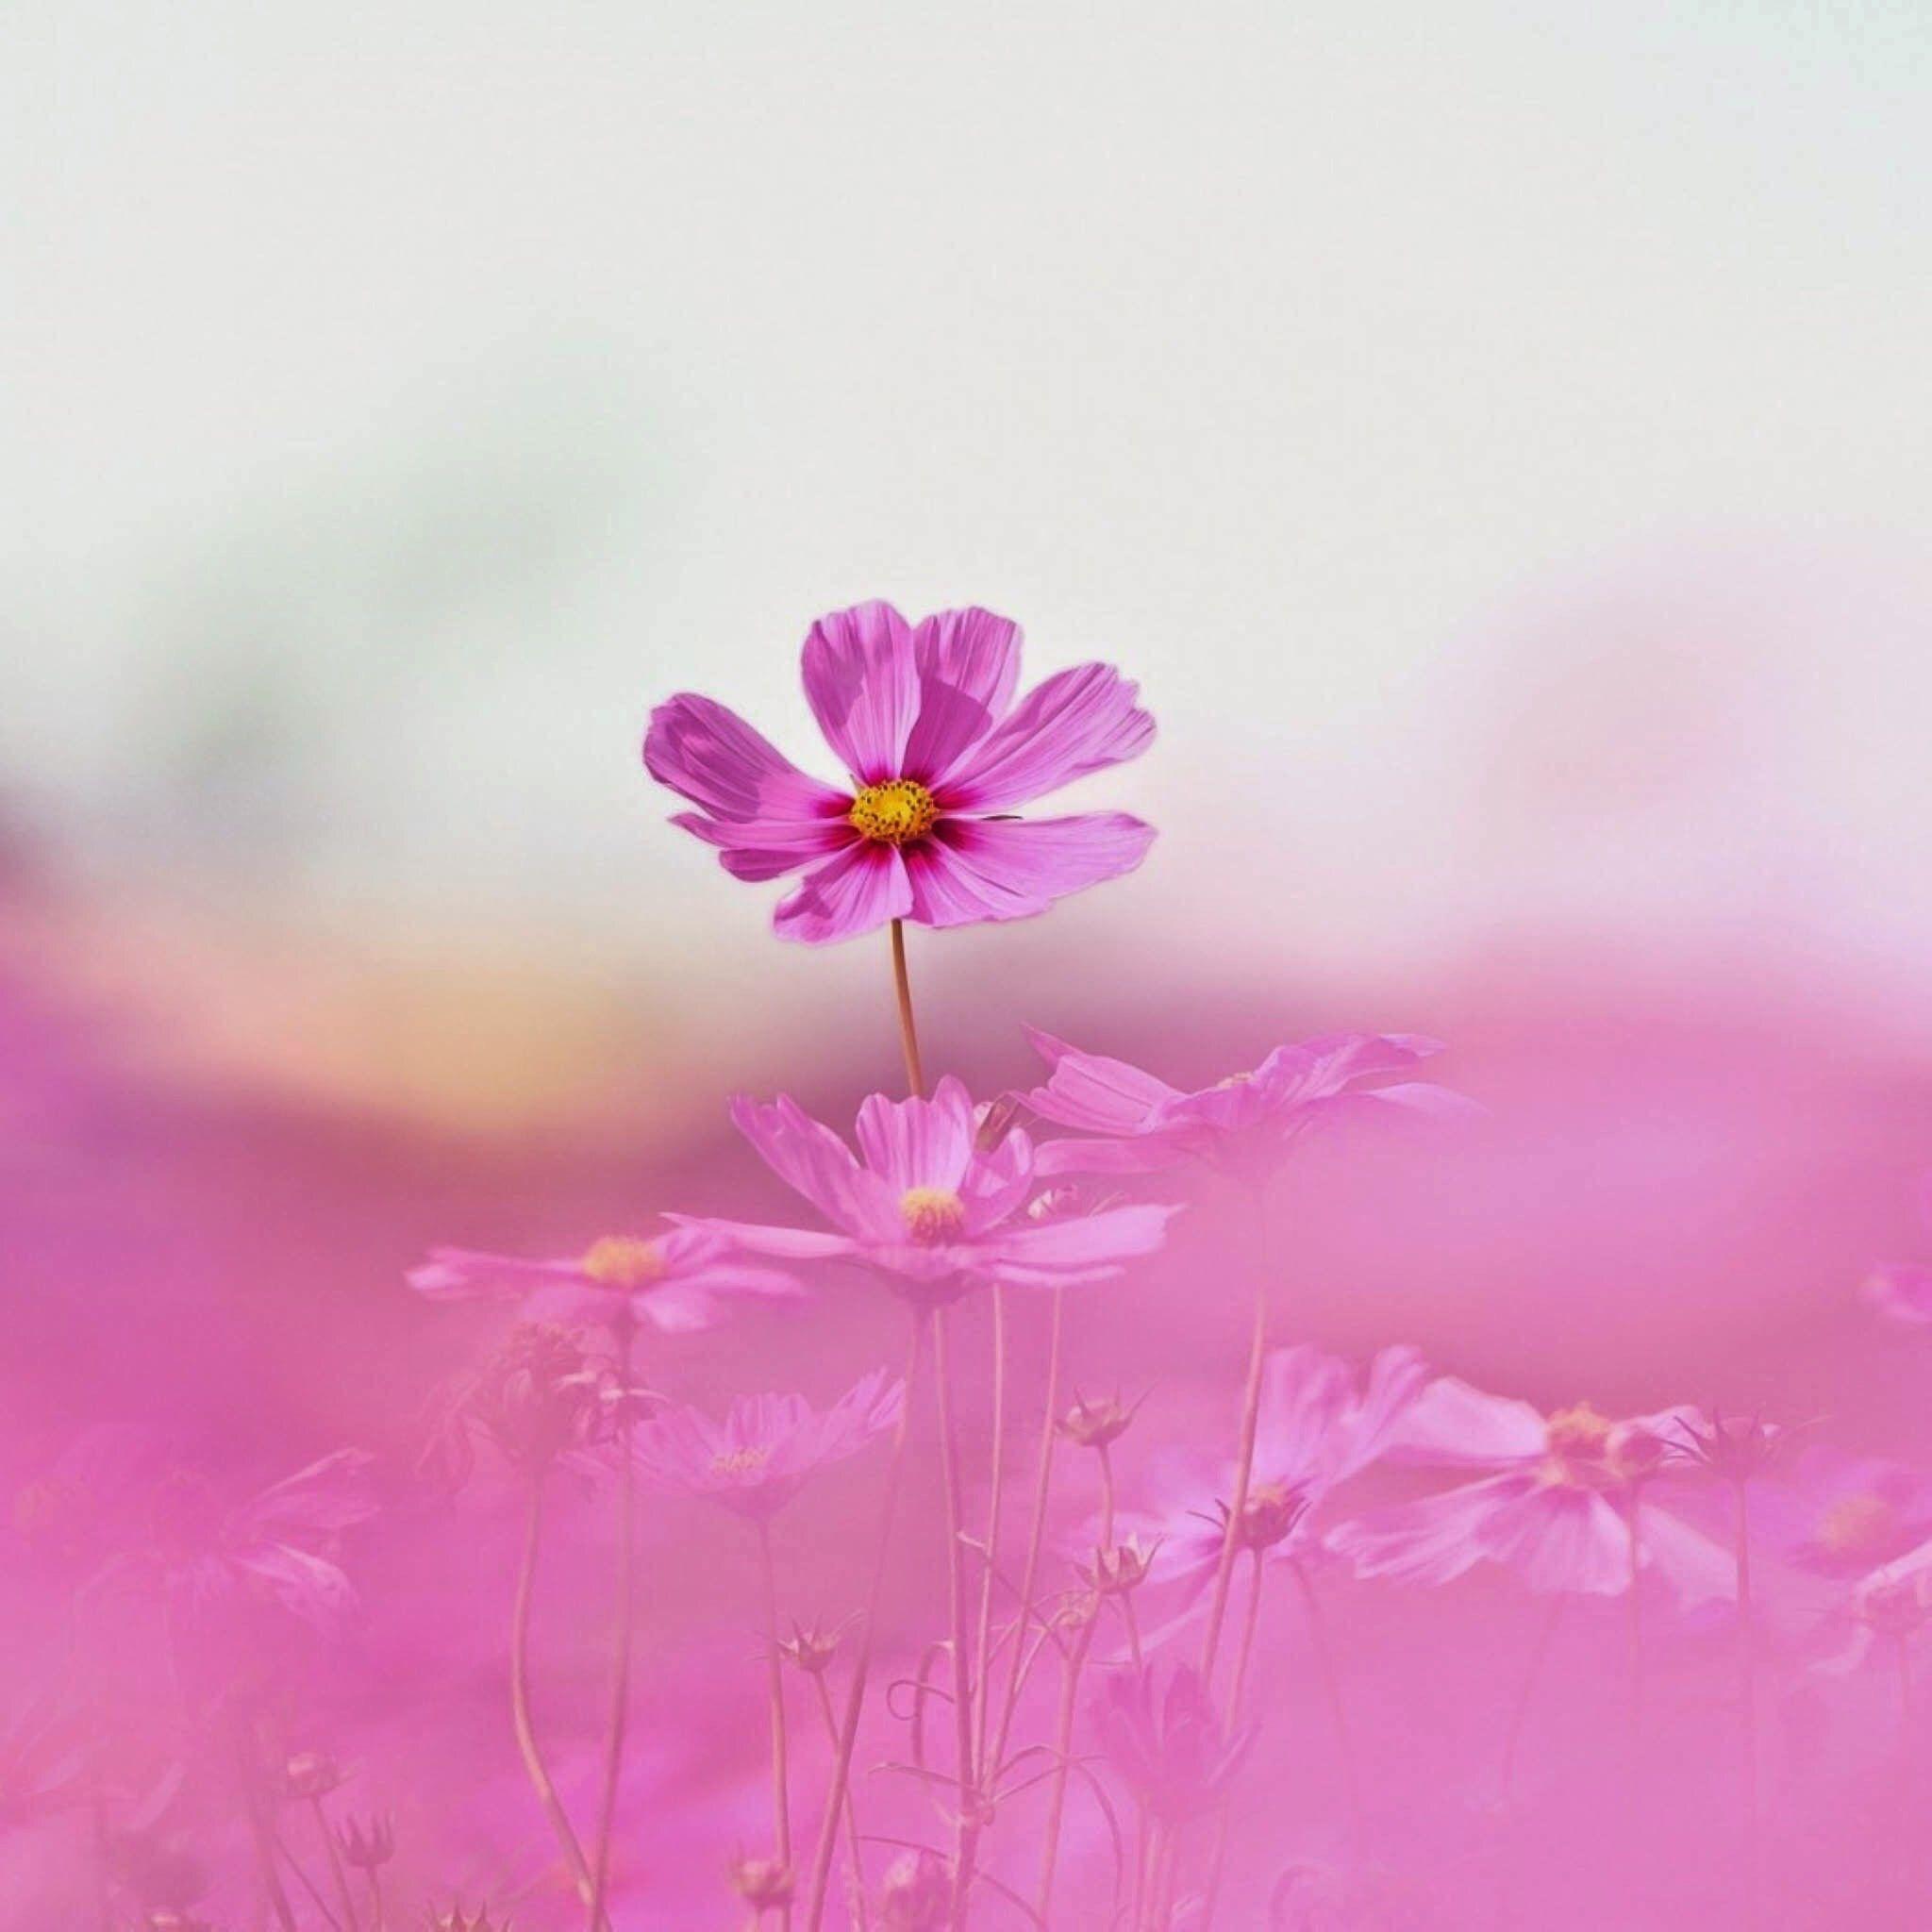 Pin by linda steadman on flowers pinterest flowers